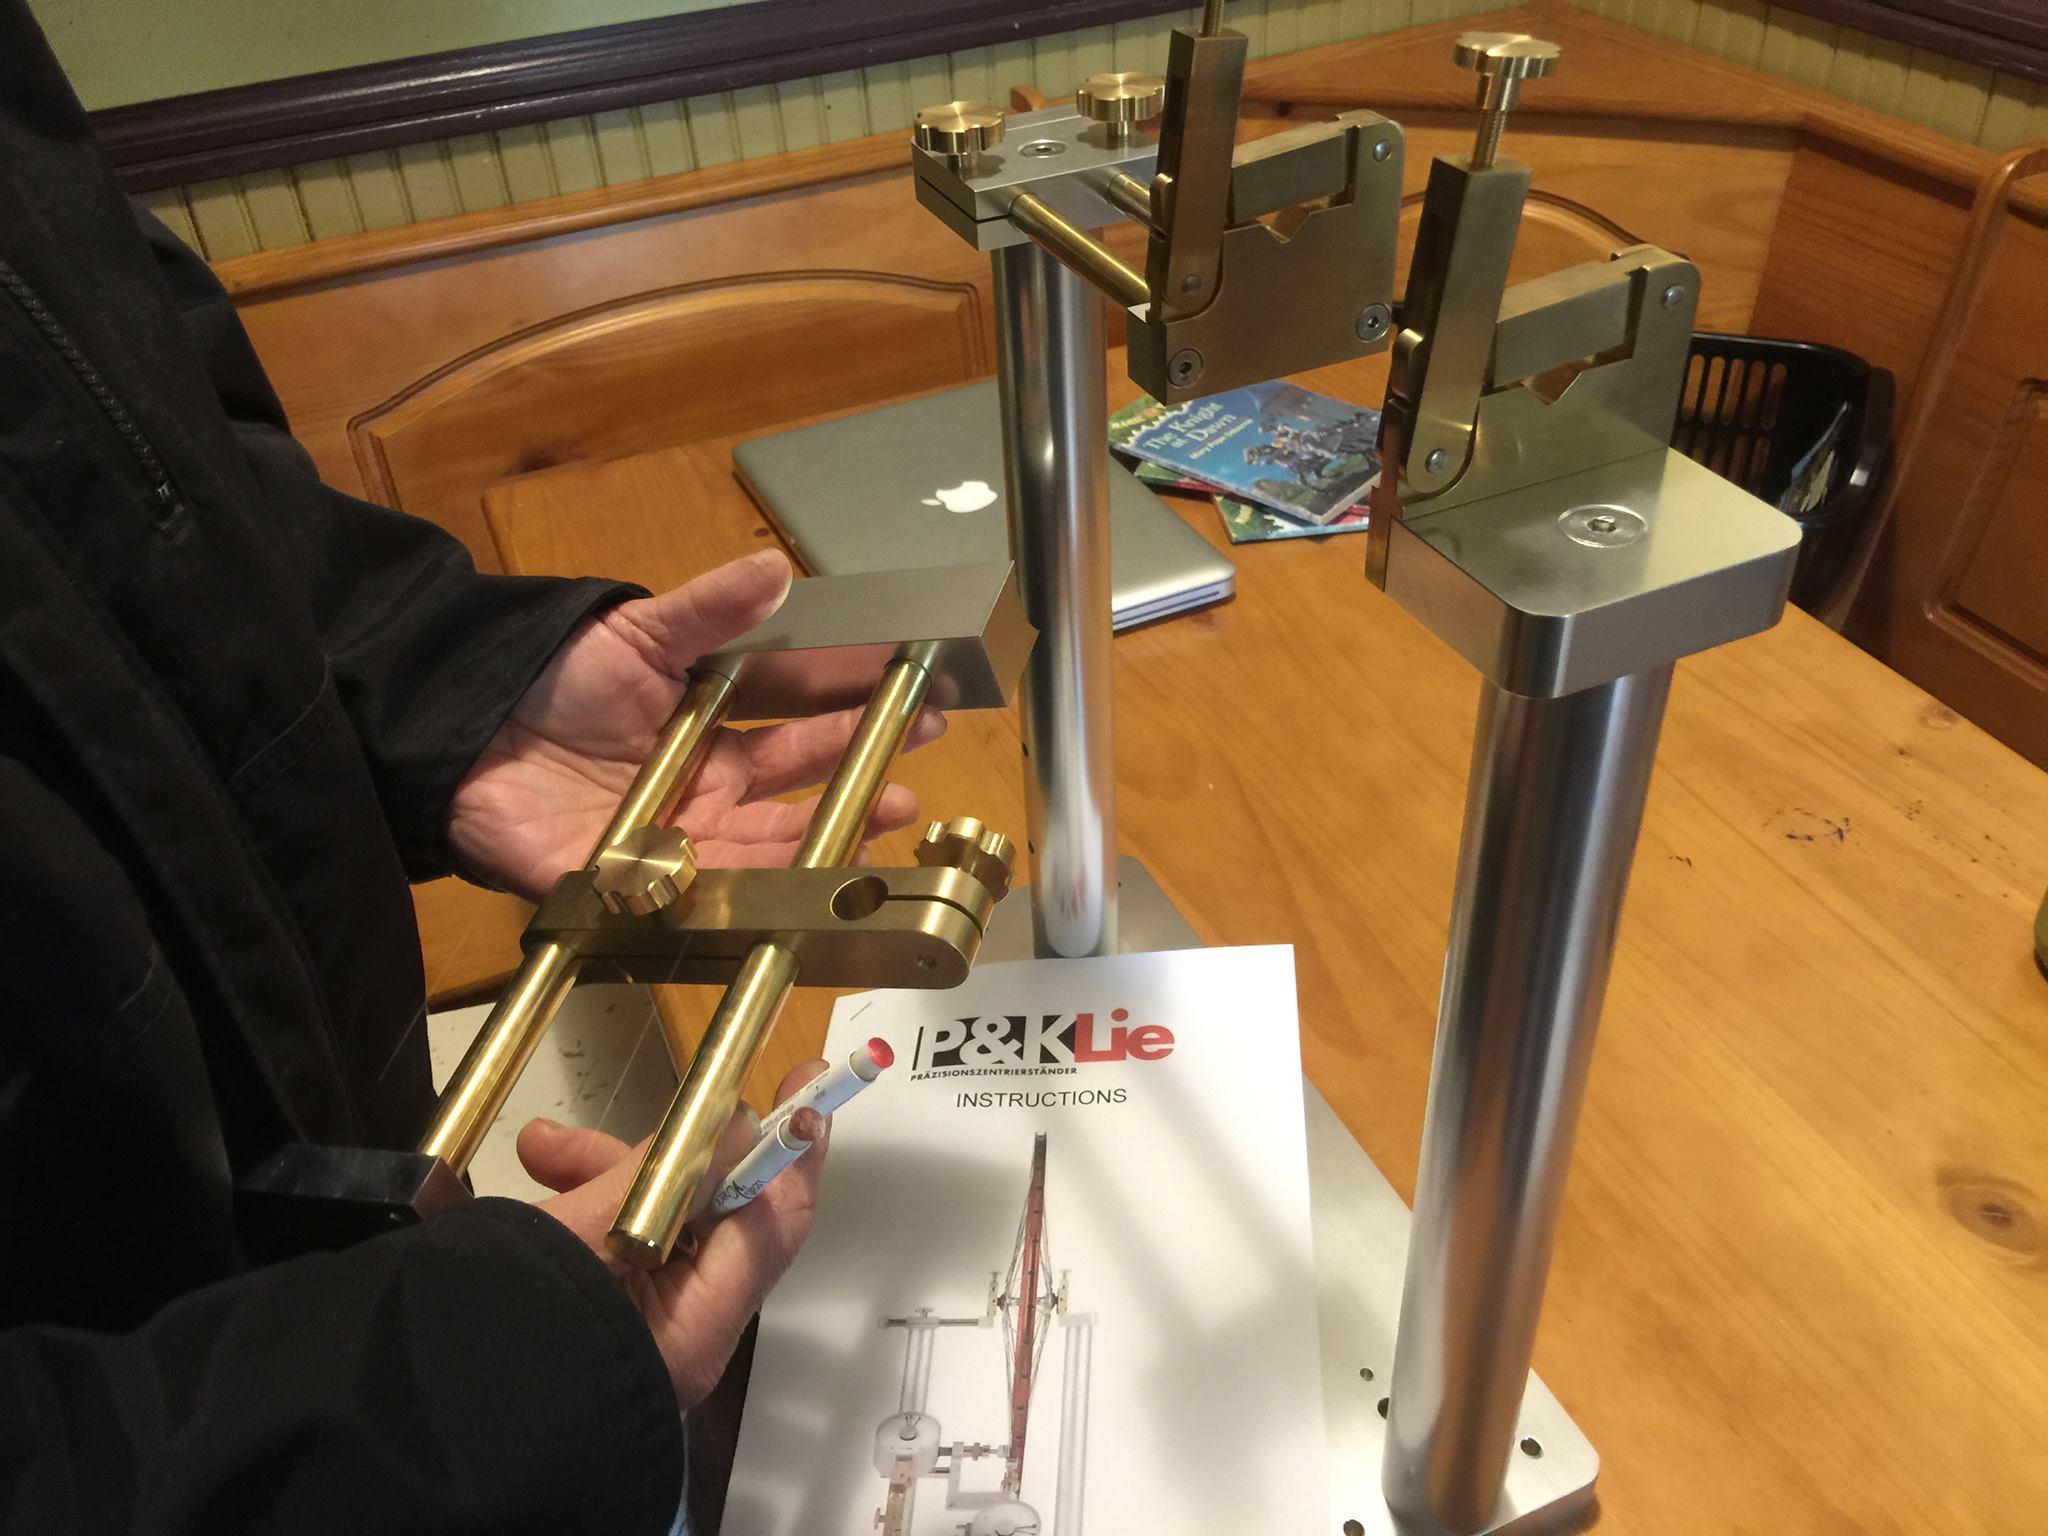 Bicycle Building Tools, P & K Lie Wheel Truing Stand, Leaded Brass Tamara Rubin Lead Safe Mama